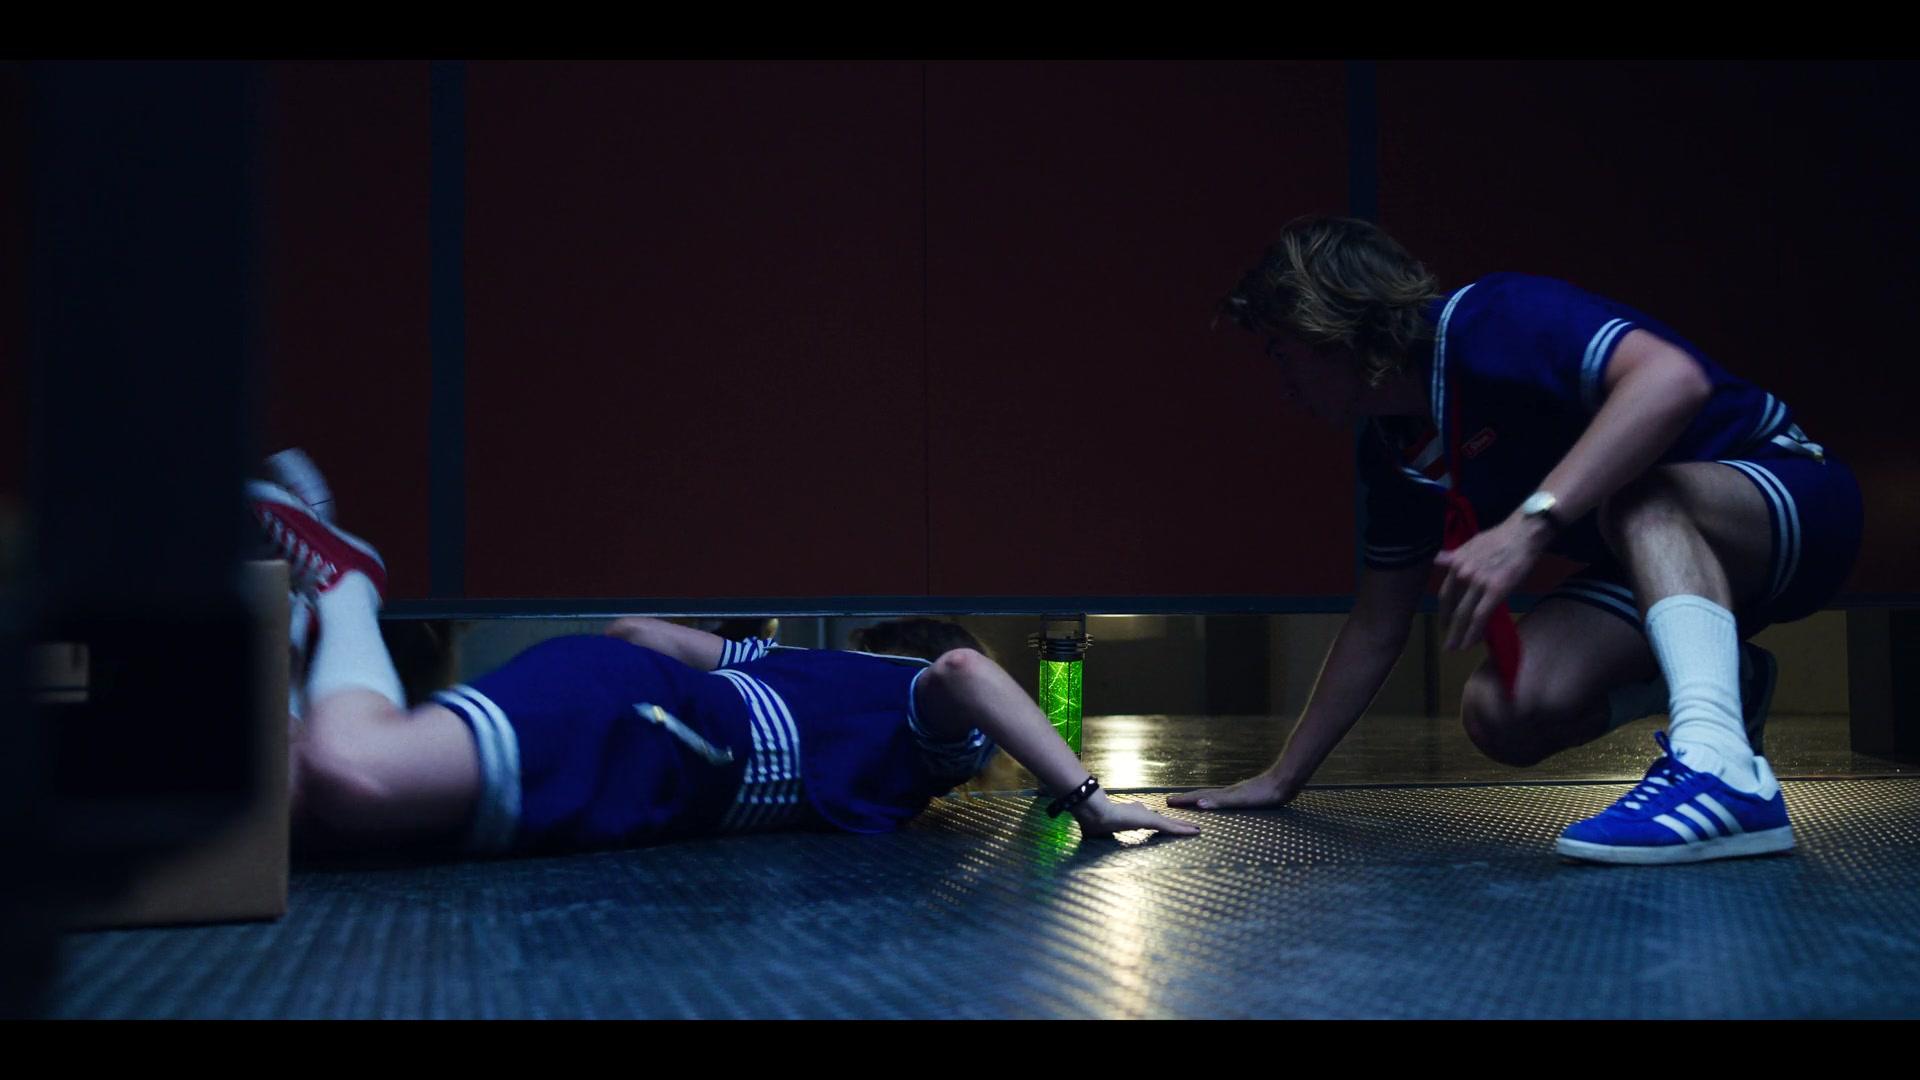 Adidas Blue Shoes Worn By Joe Keery As Steve Harrington In